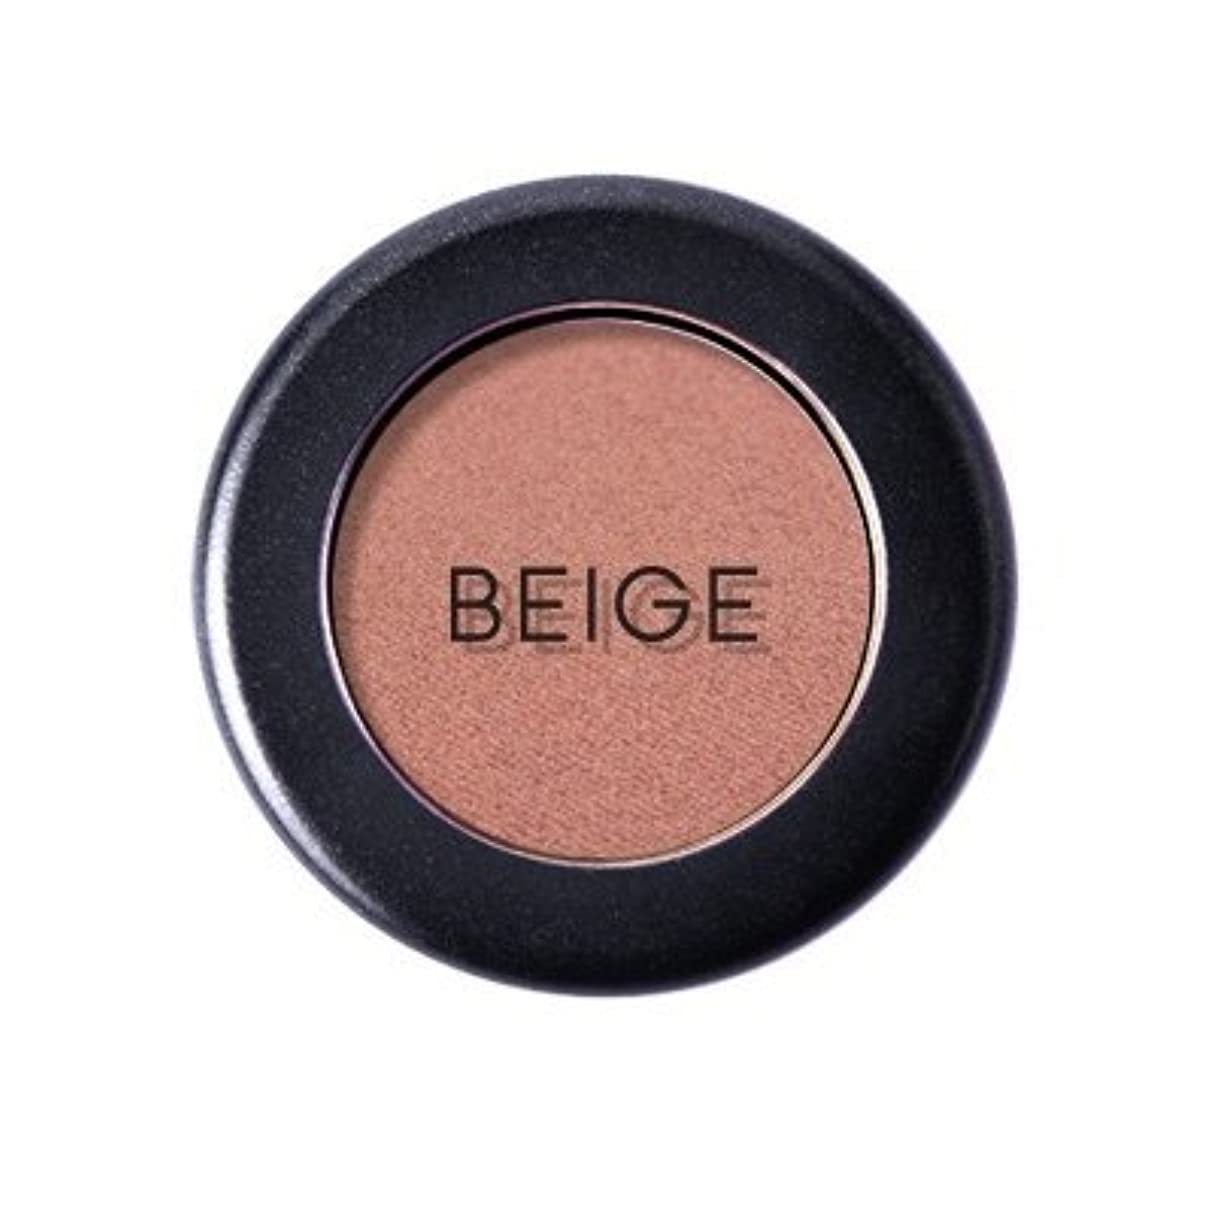 BEIGE CHUU Eyeshadow (#225 CAMEL BROWN) / ベージュ チュウ アイシャドウ [並行輸入品]